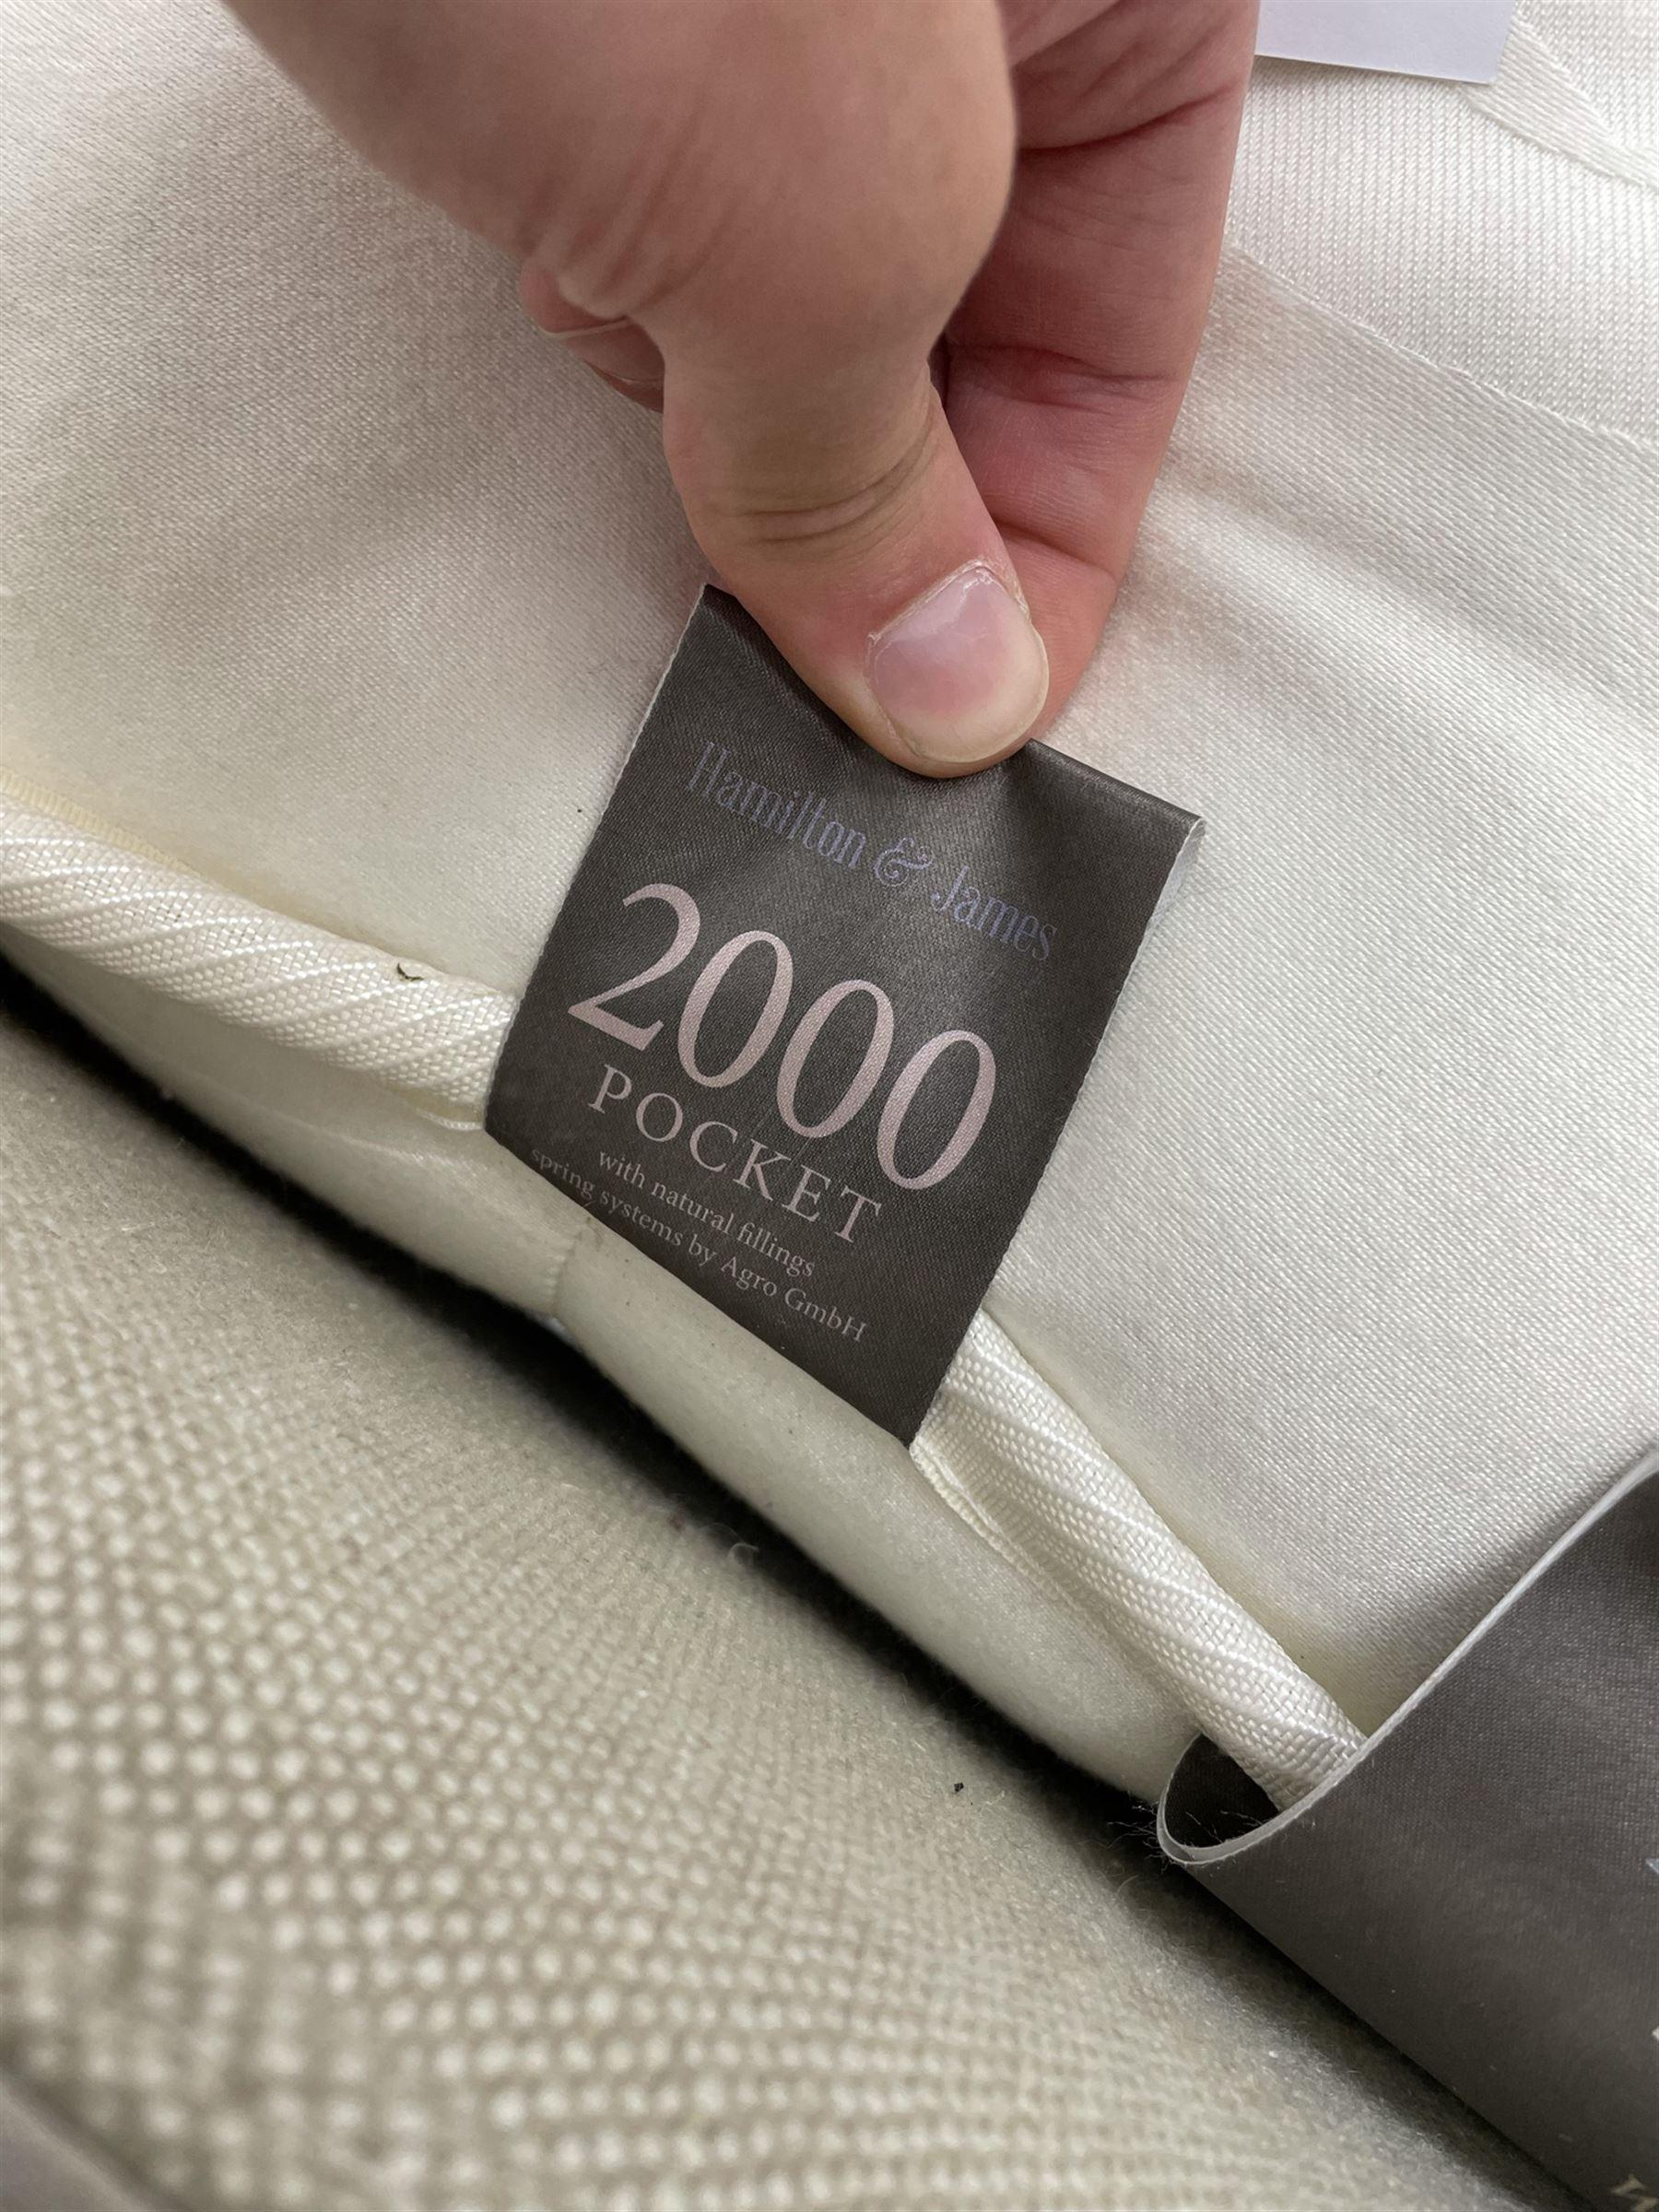 Graham & Green Evelyn - French style Kingsize 5' bedstead upholstered in natural light grey linen - Image 3 of 6